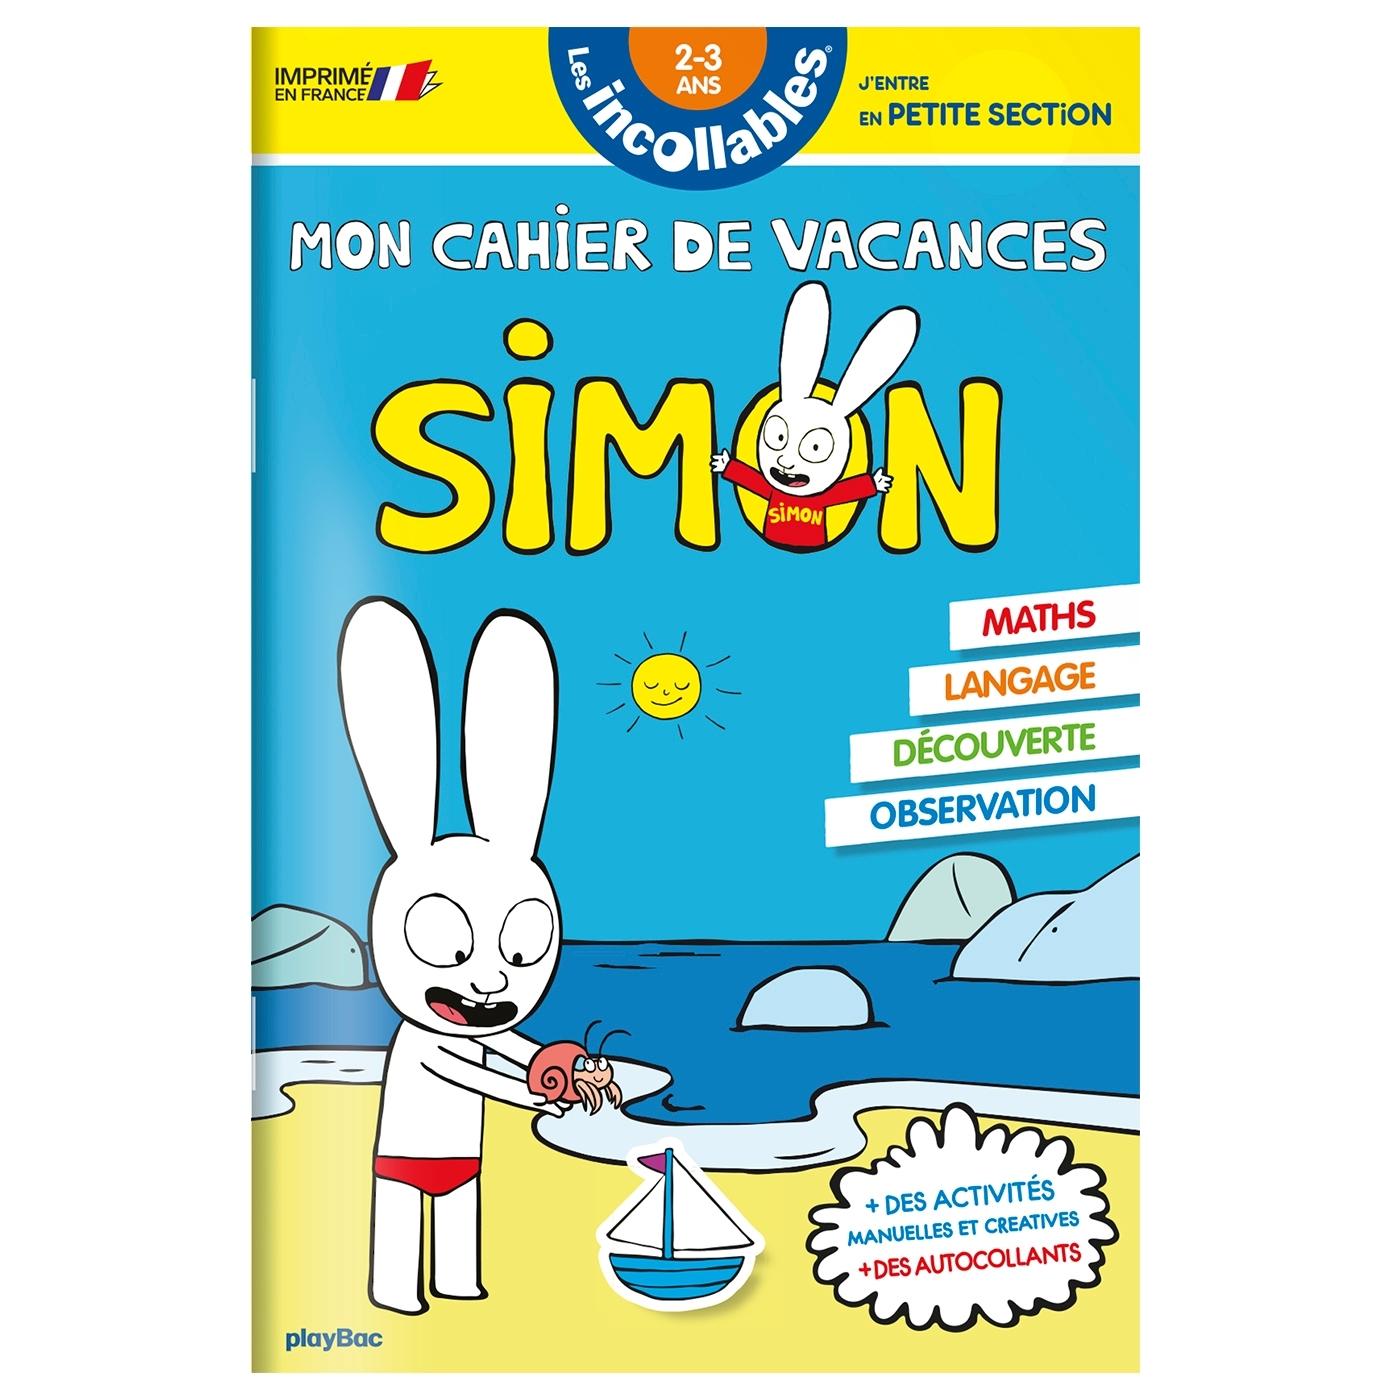 CAHIER DE VACANCES SIMON - DE LA TPS A LA PS